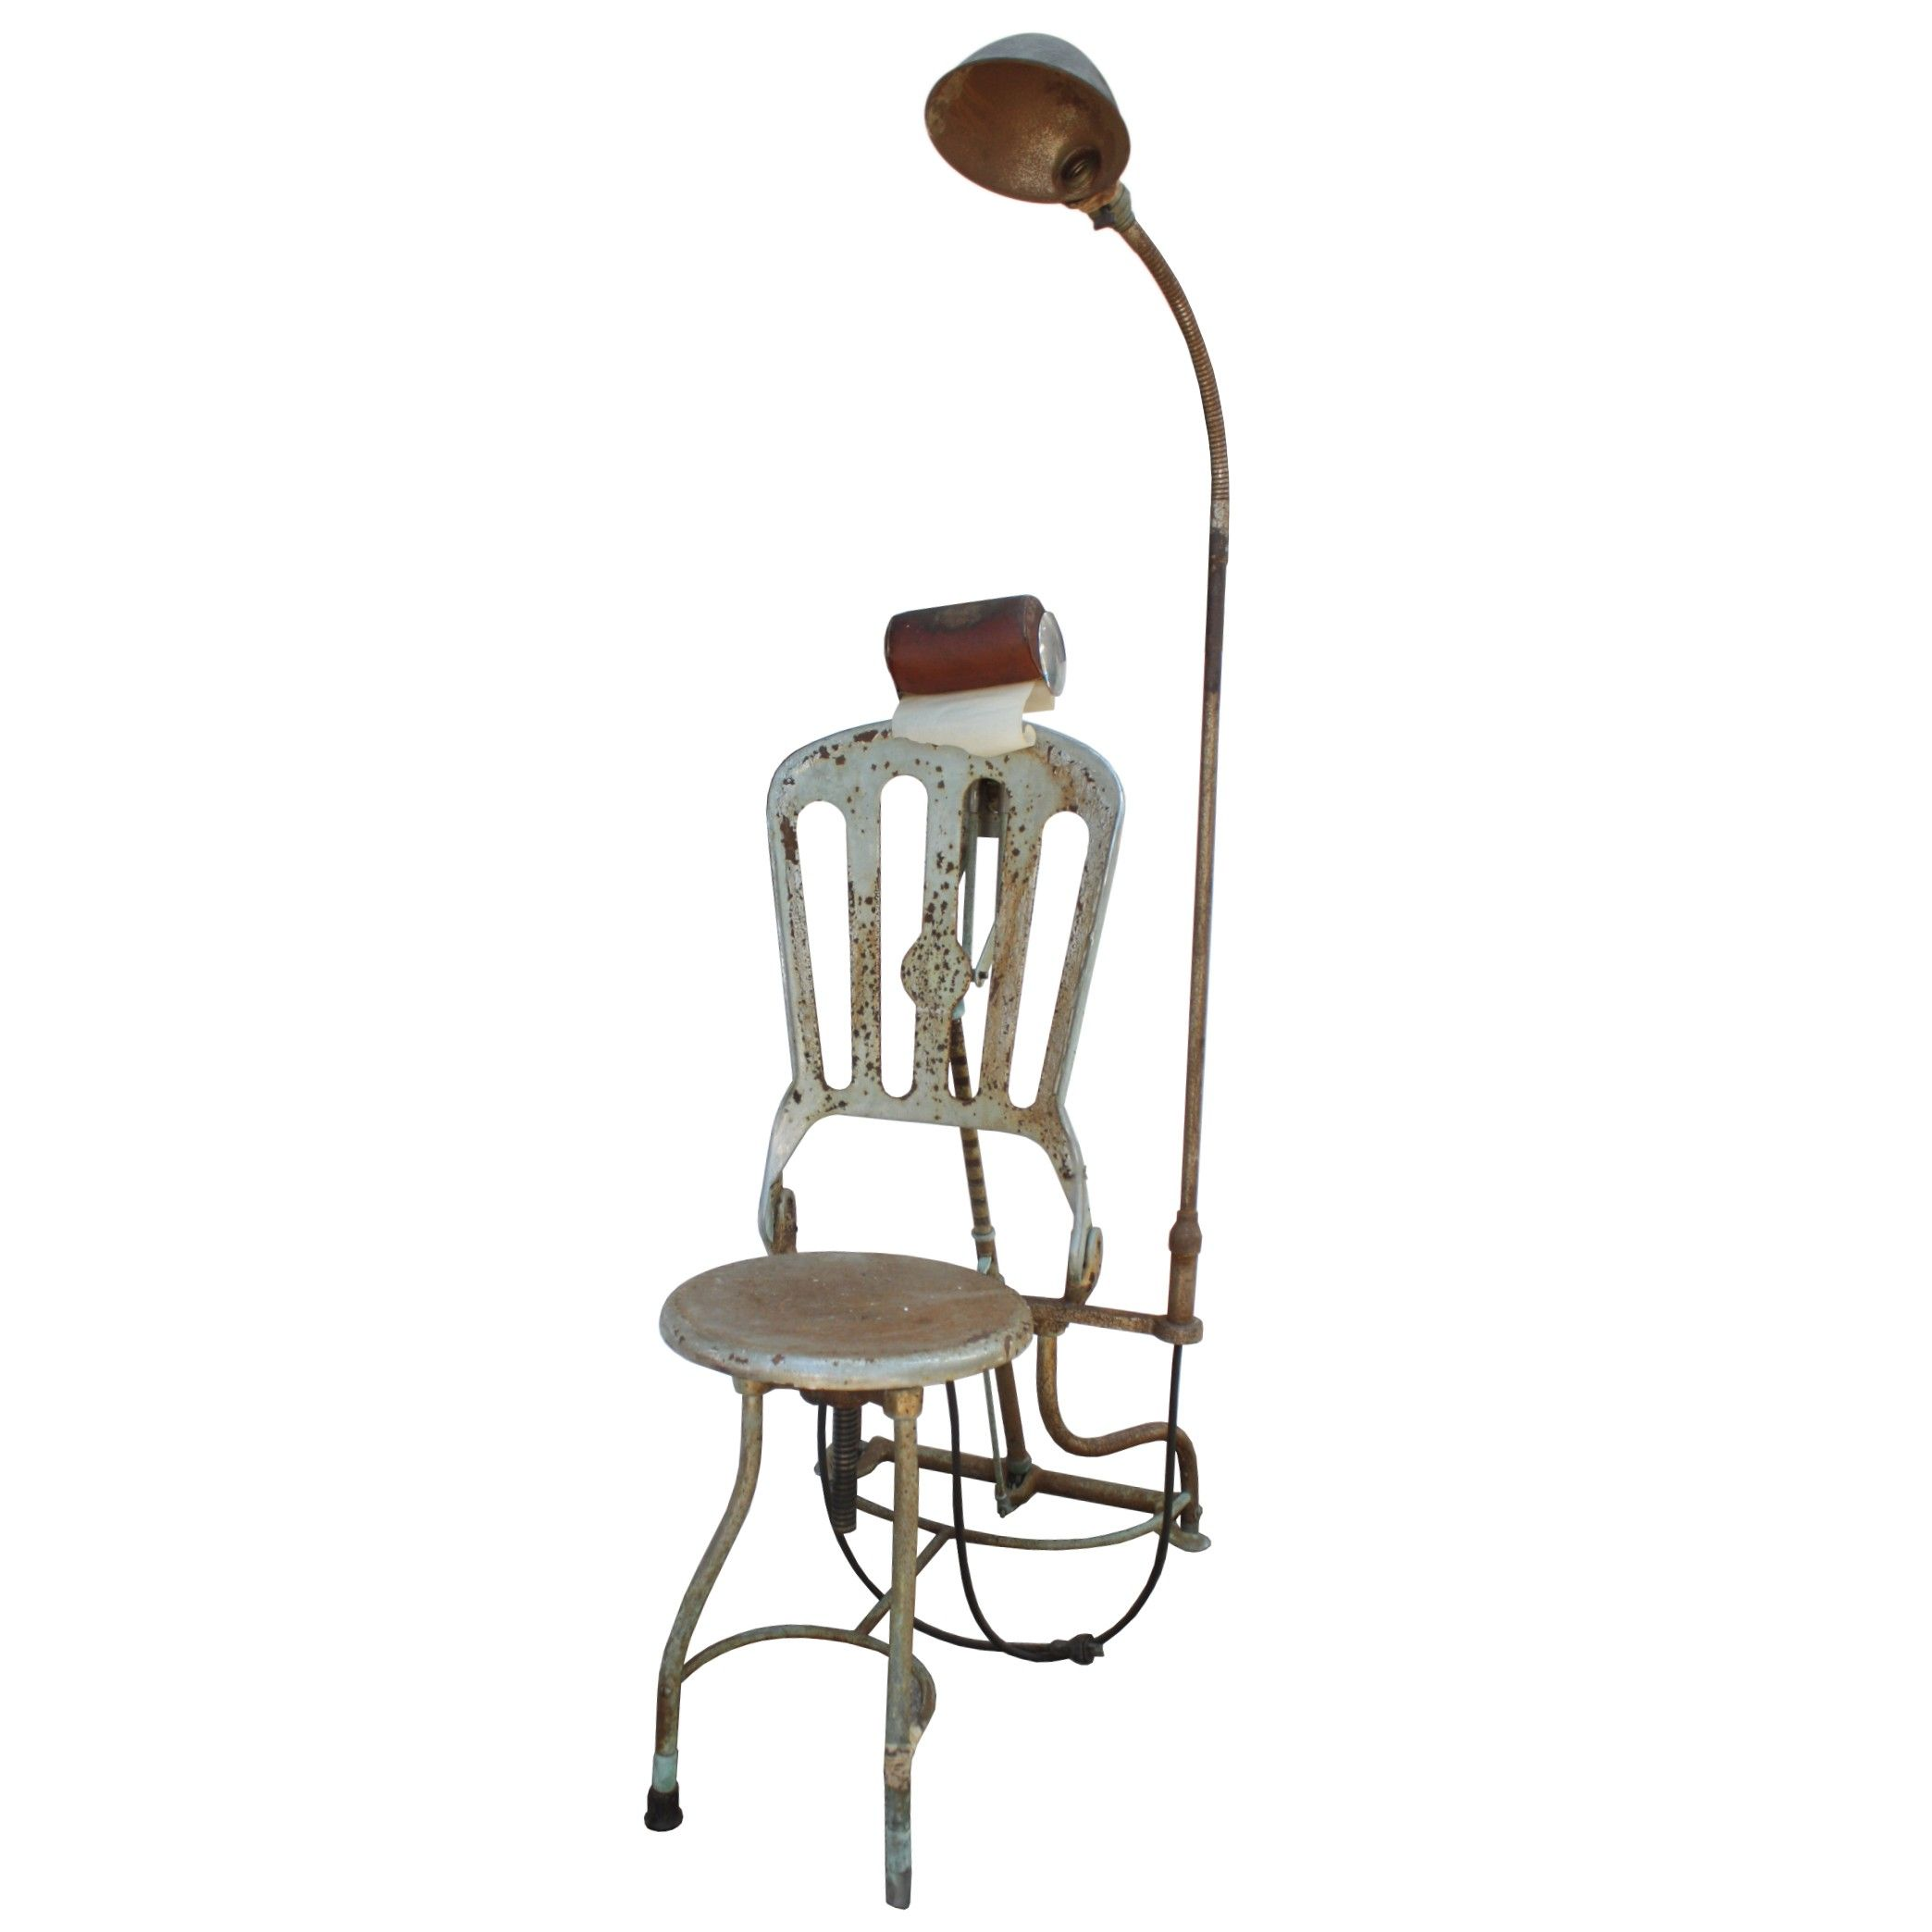 Fantastic Antique Dental Chair Dayton OH